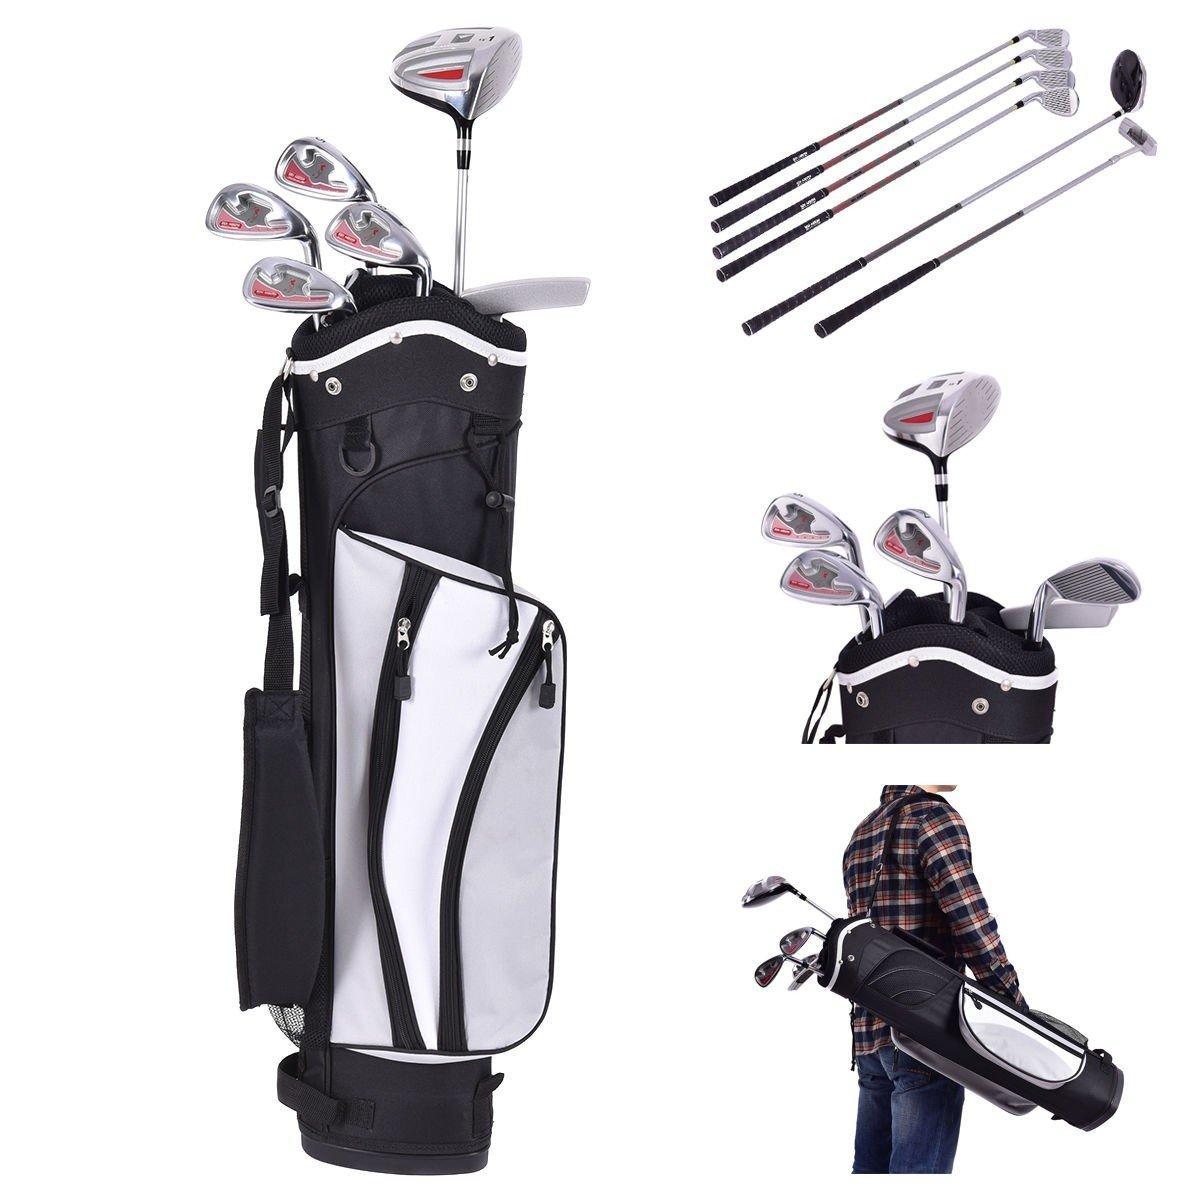 6 pcs Kids Wood Iron Putter Golf Club Set w/ Stand Bag - Silver by Apontus